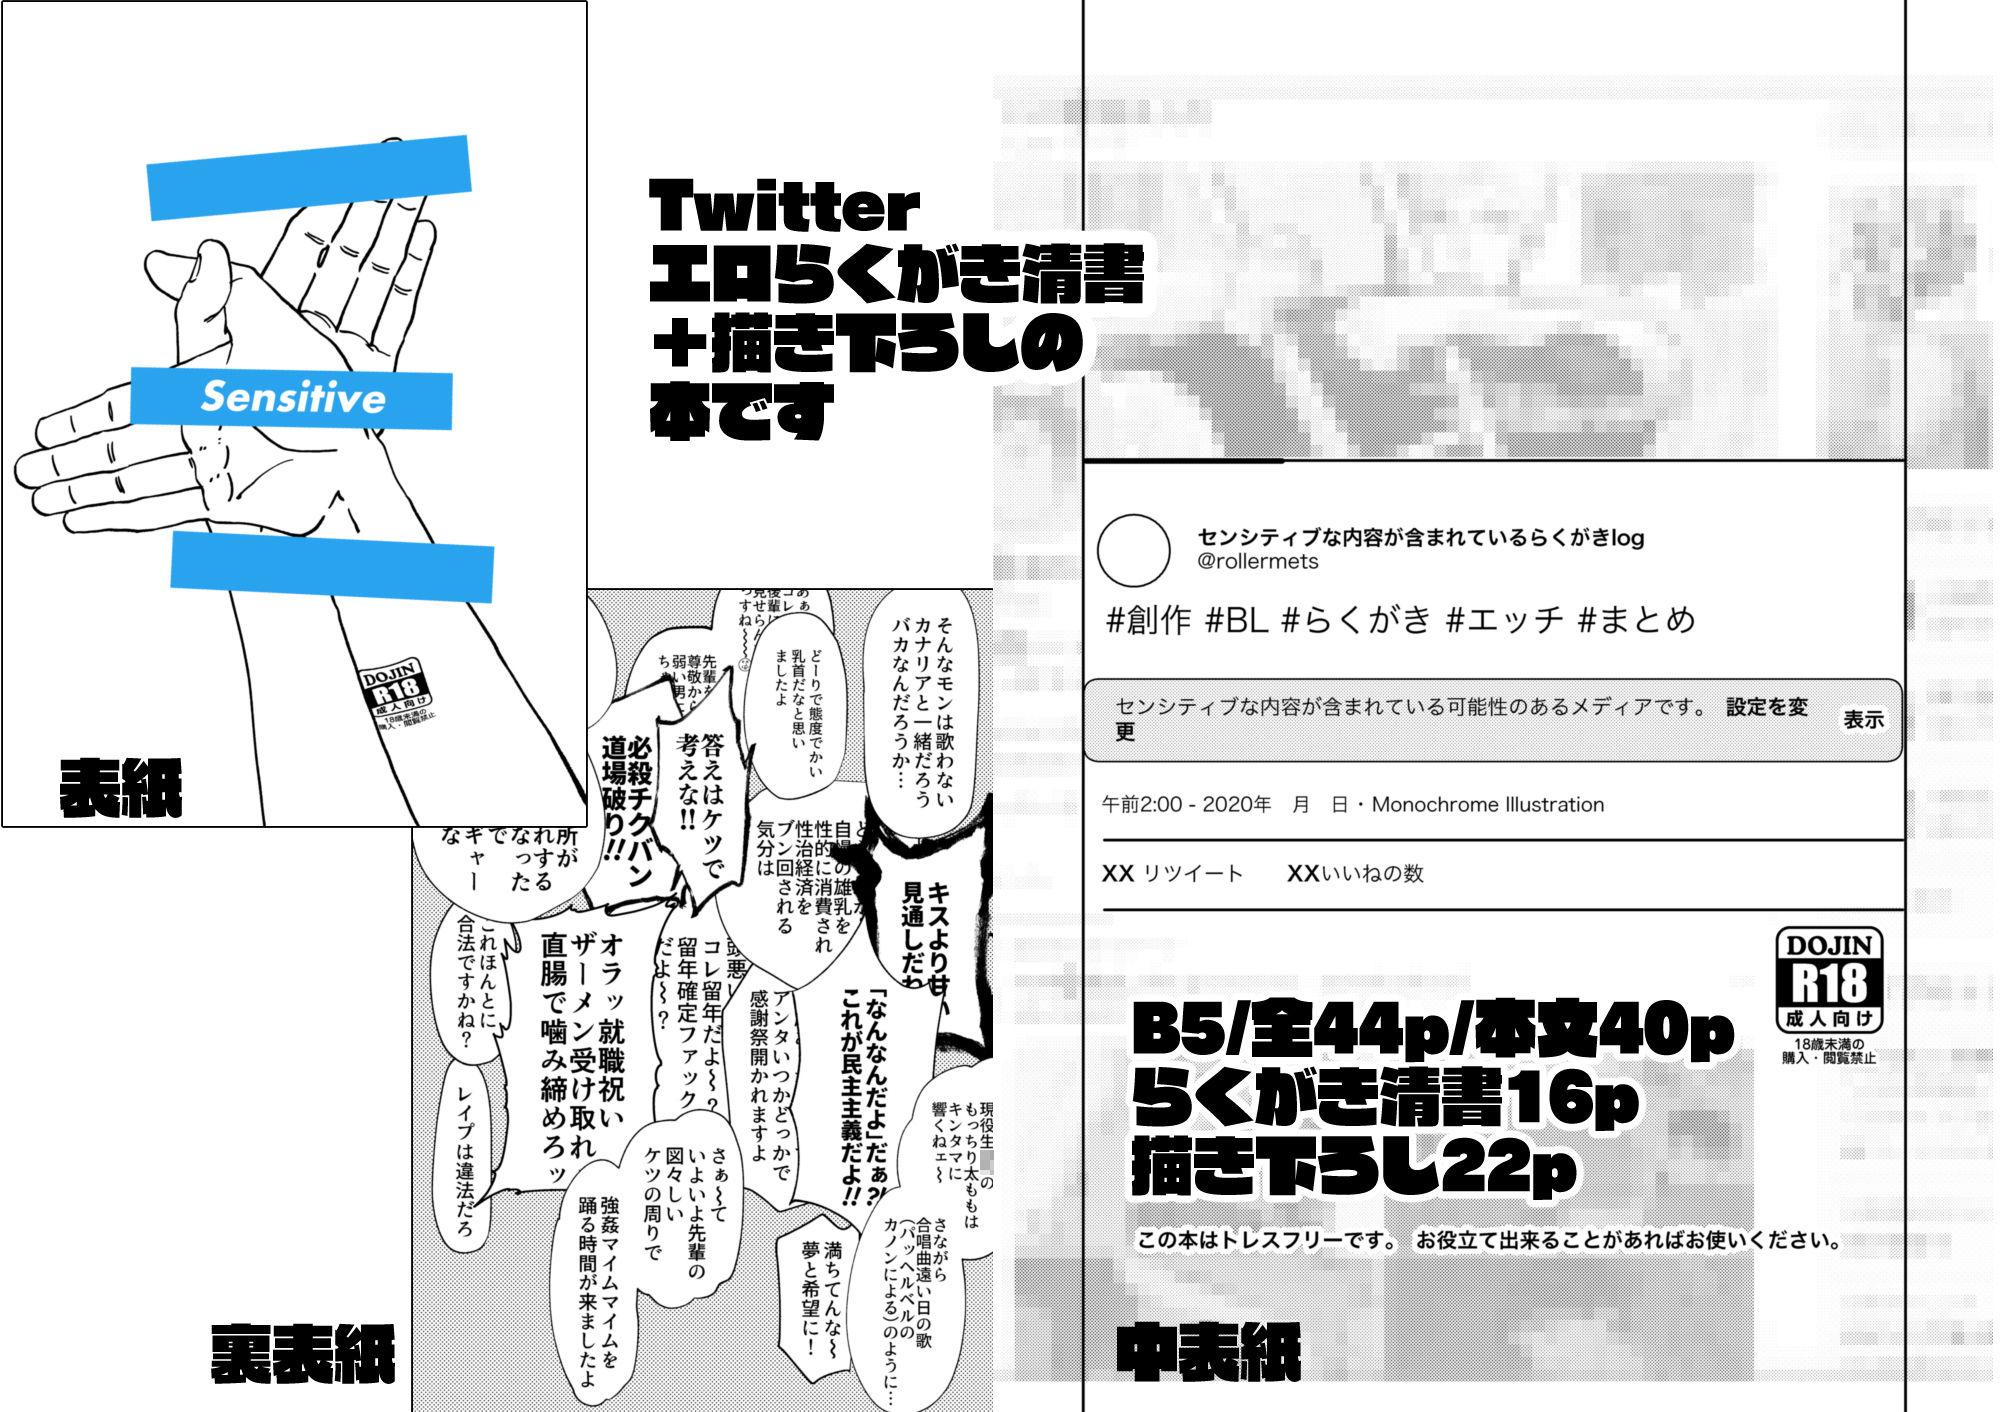 Sensiteve-モノクロらくがきまとめ画像no.1